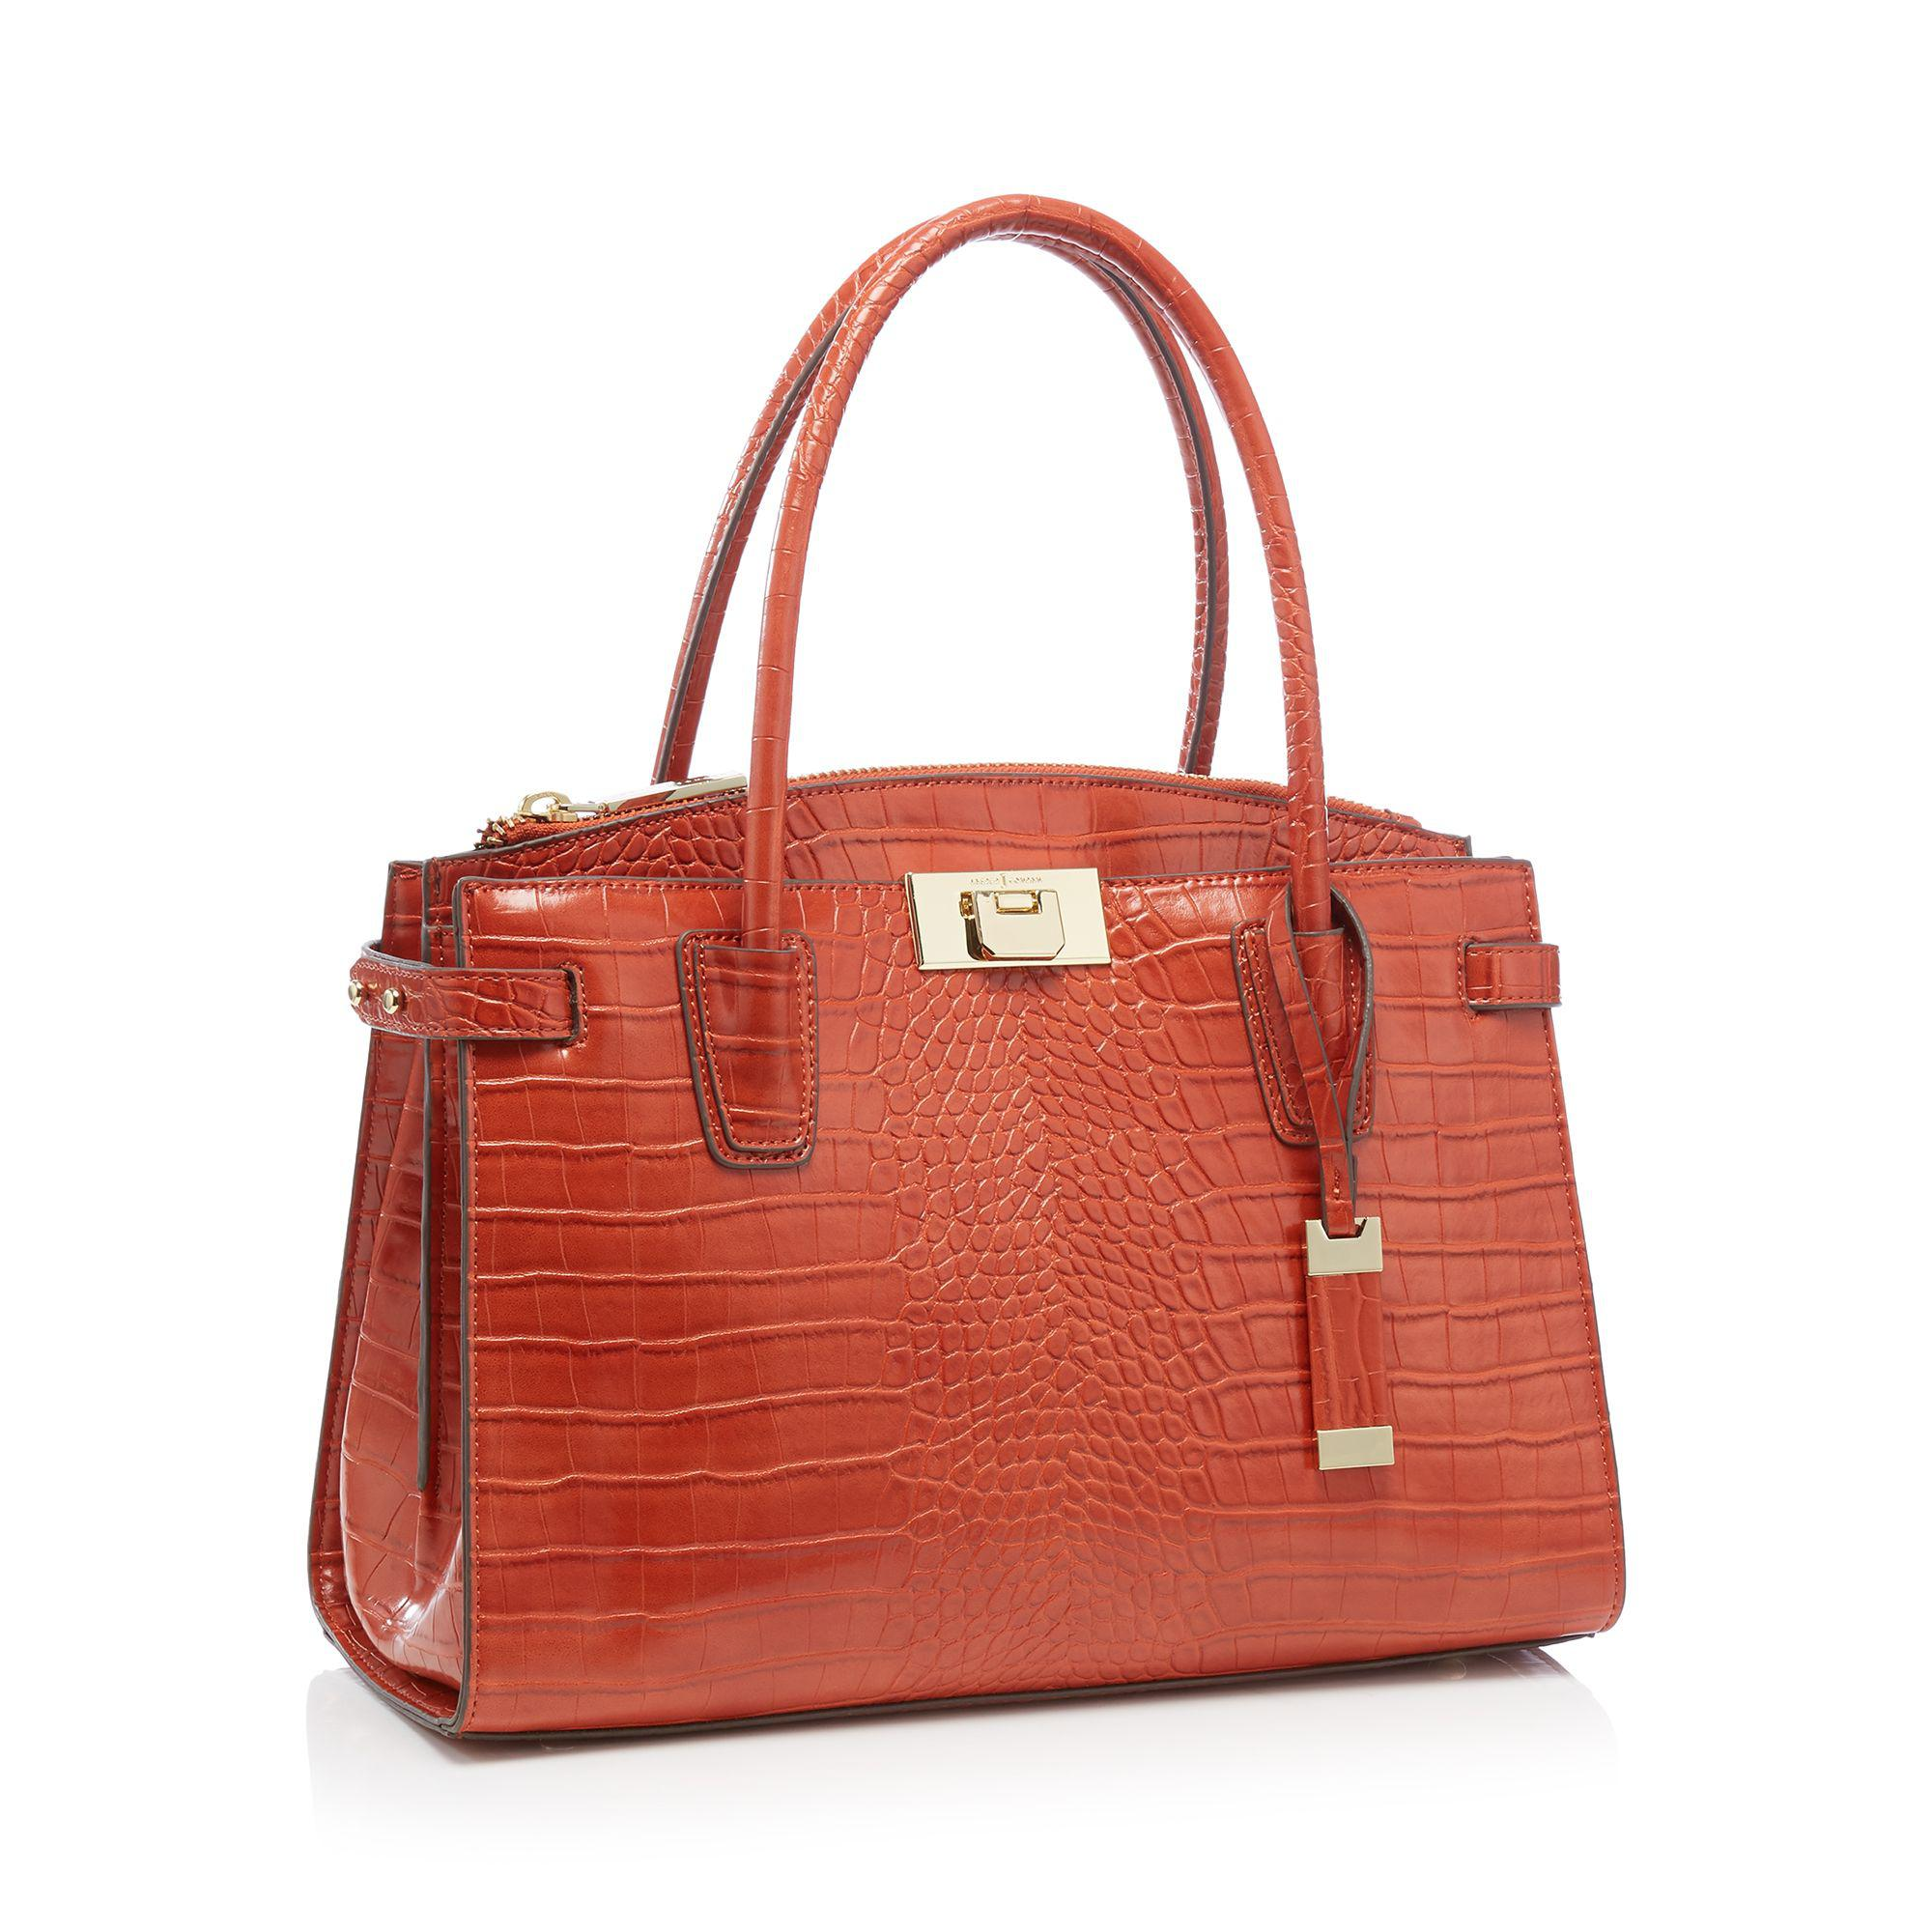 cfdc36b941a0 J By Jasper Conran  green Park  Music Grab Bag in Orange - Lyst